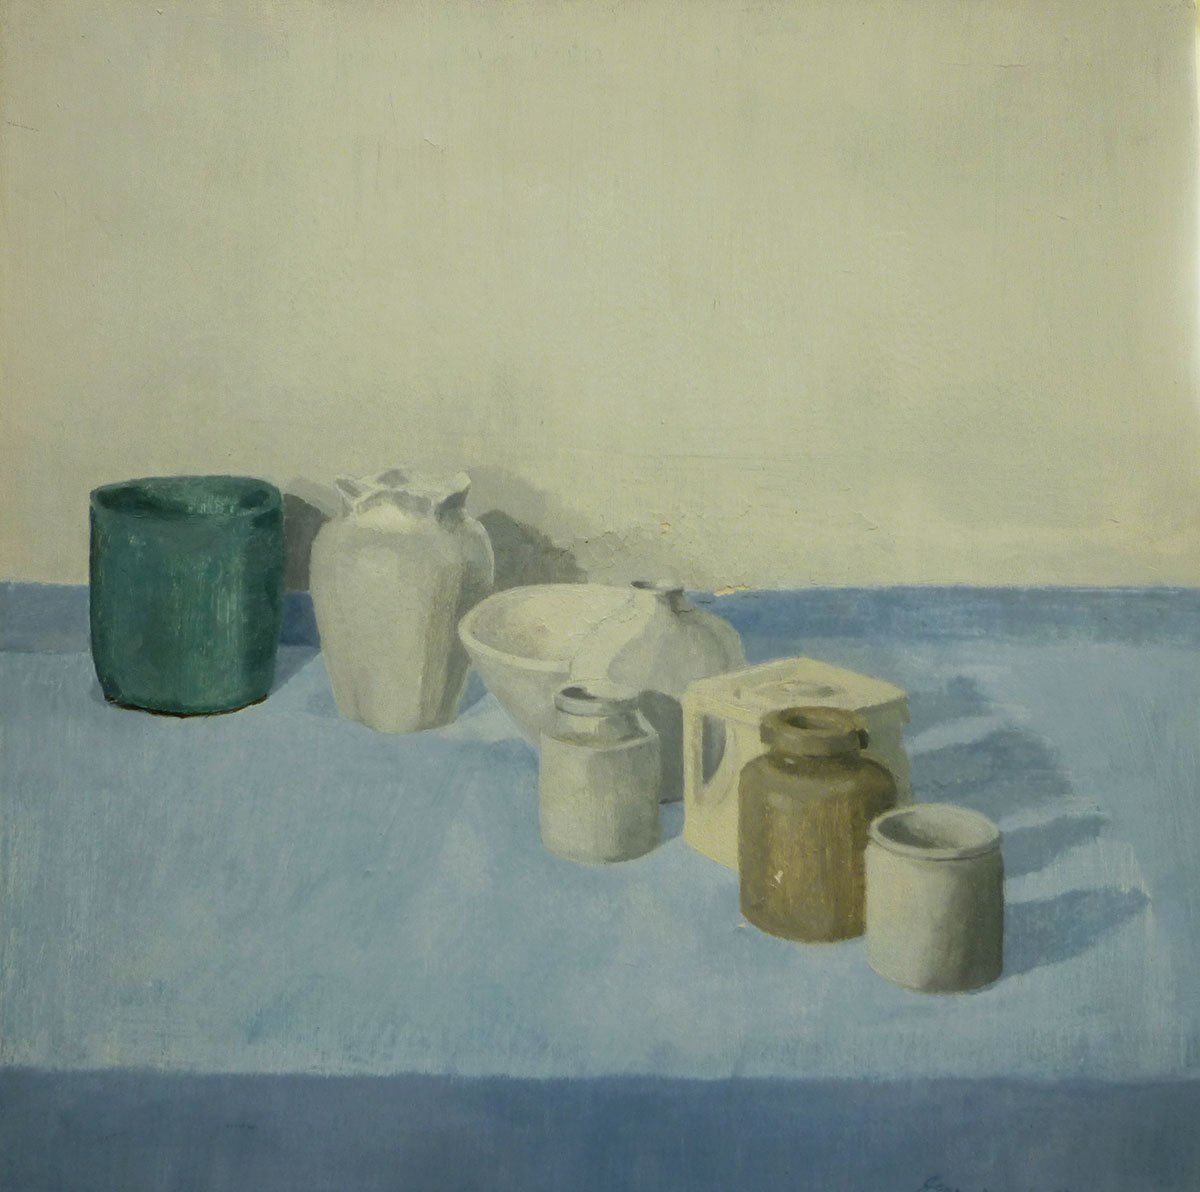 47-Untitled-1995